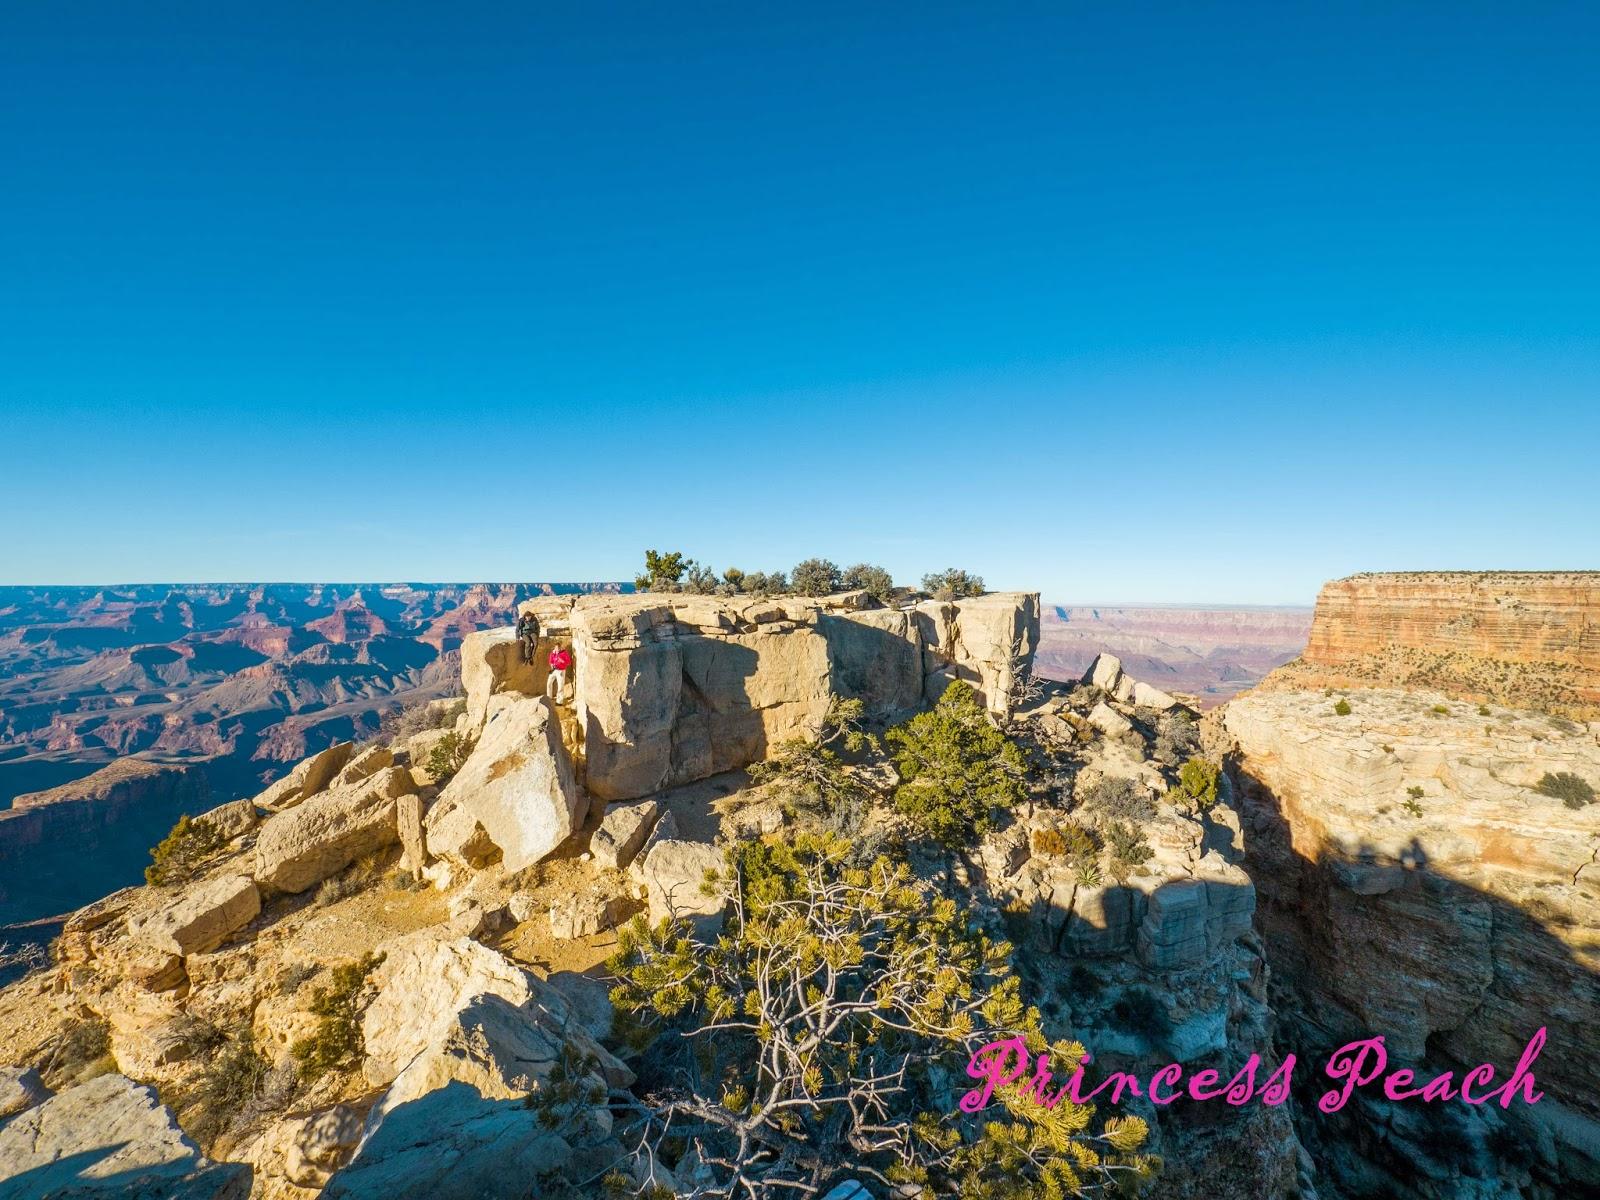 Grand-Canyon-National-Park-大峽谷國家公園攀岩